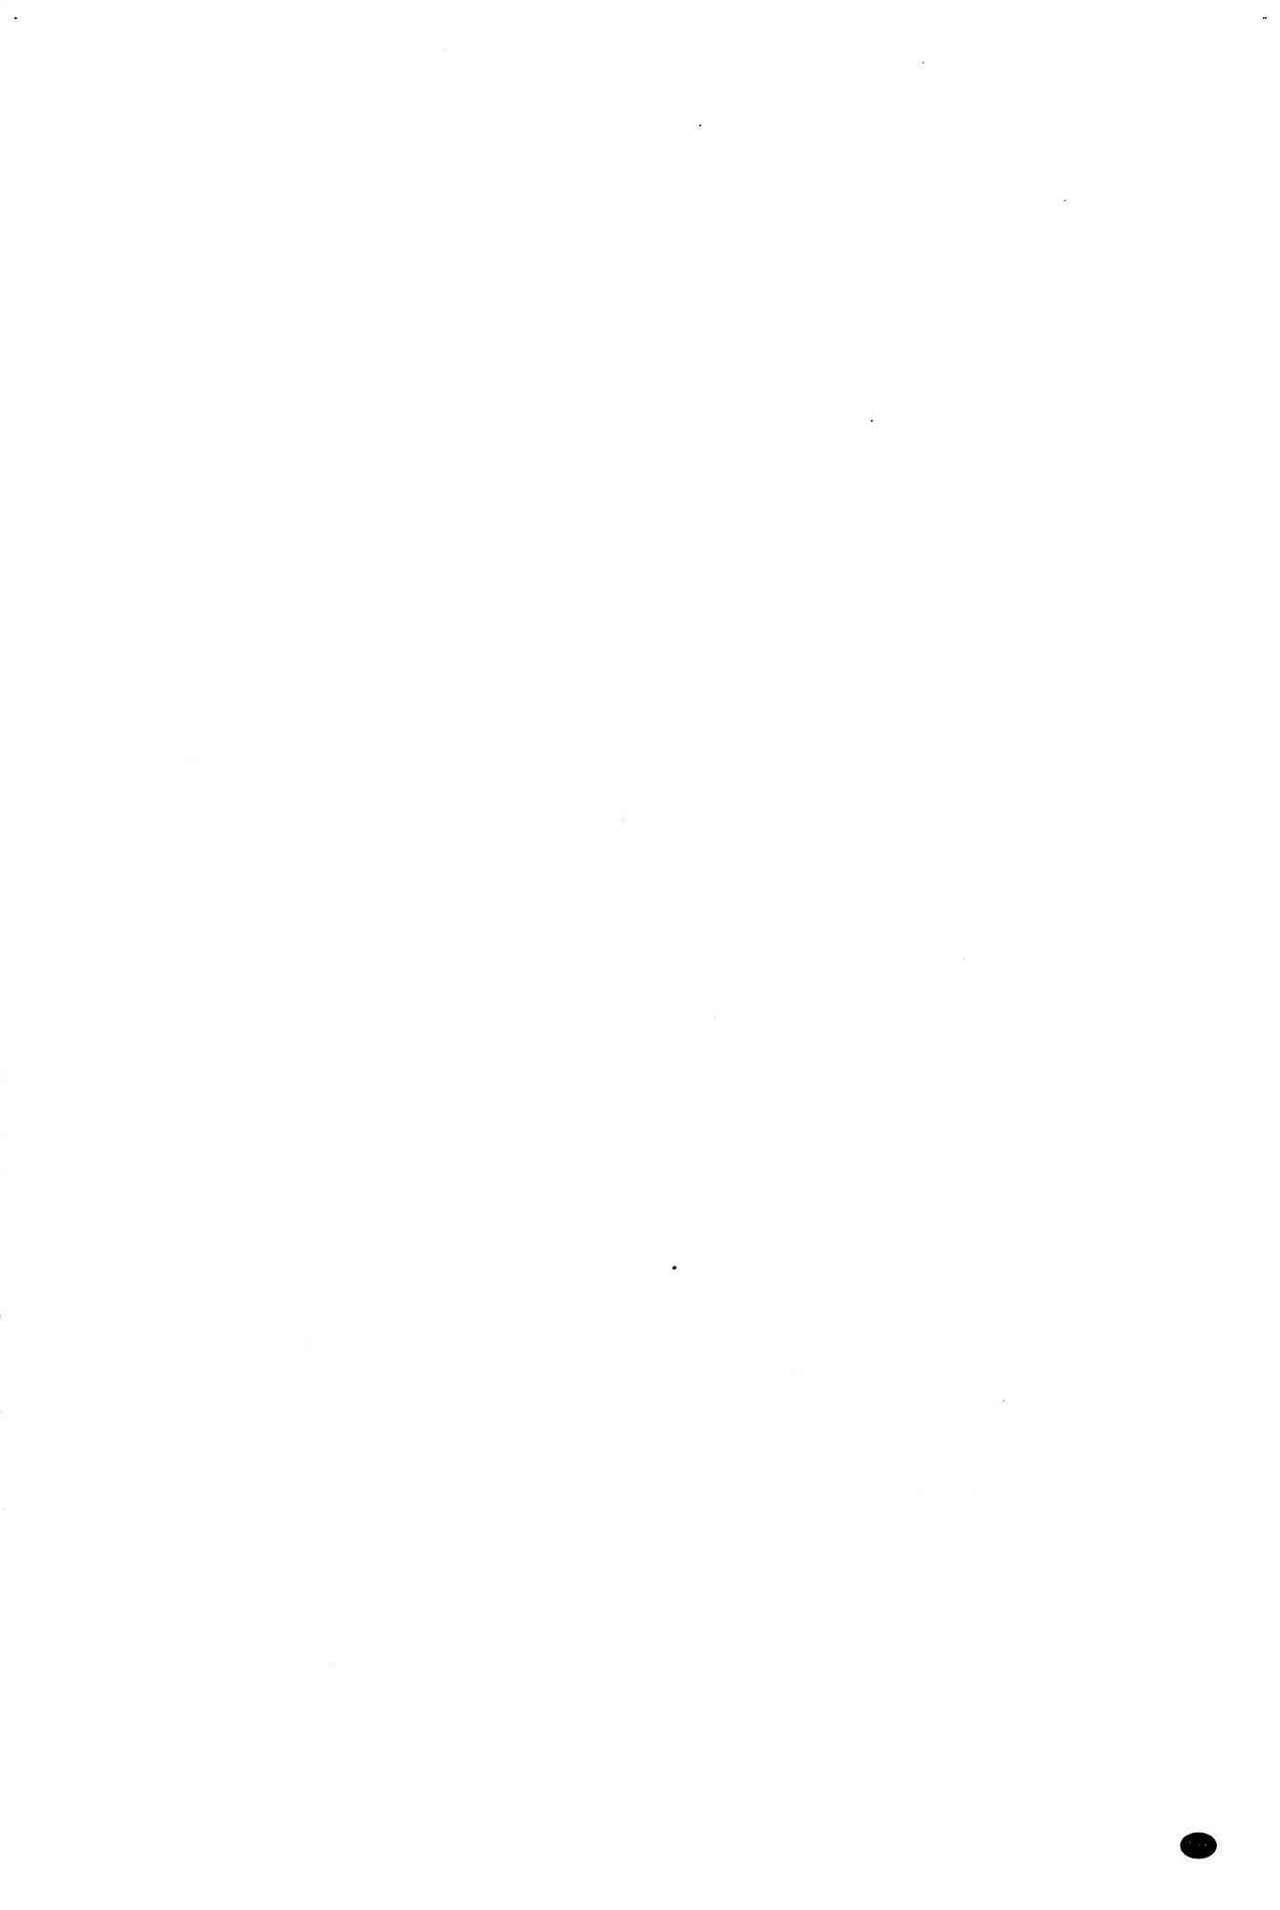 [Gotoh Akira]  21-ji no Onna ~Camera no Mae no Mesuinu~ 2 | 21時之女 ~鏡頭前的牝犬~ 2 [Chinese] 137